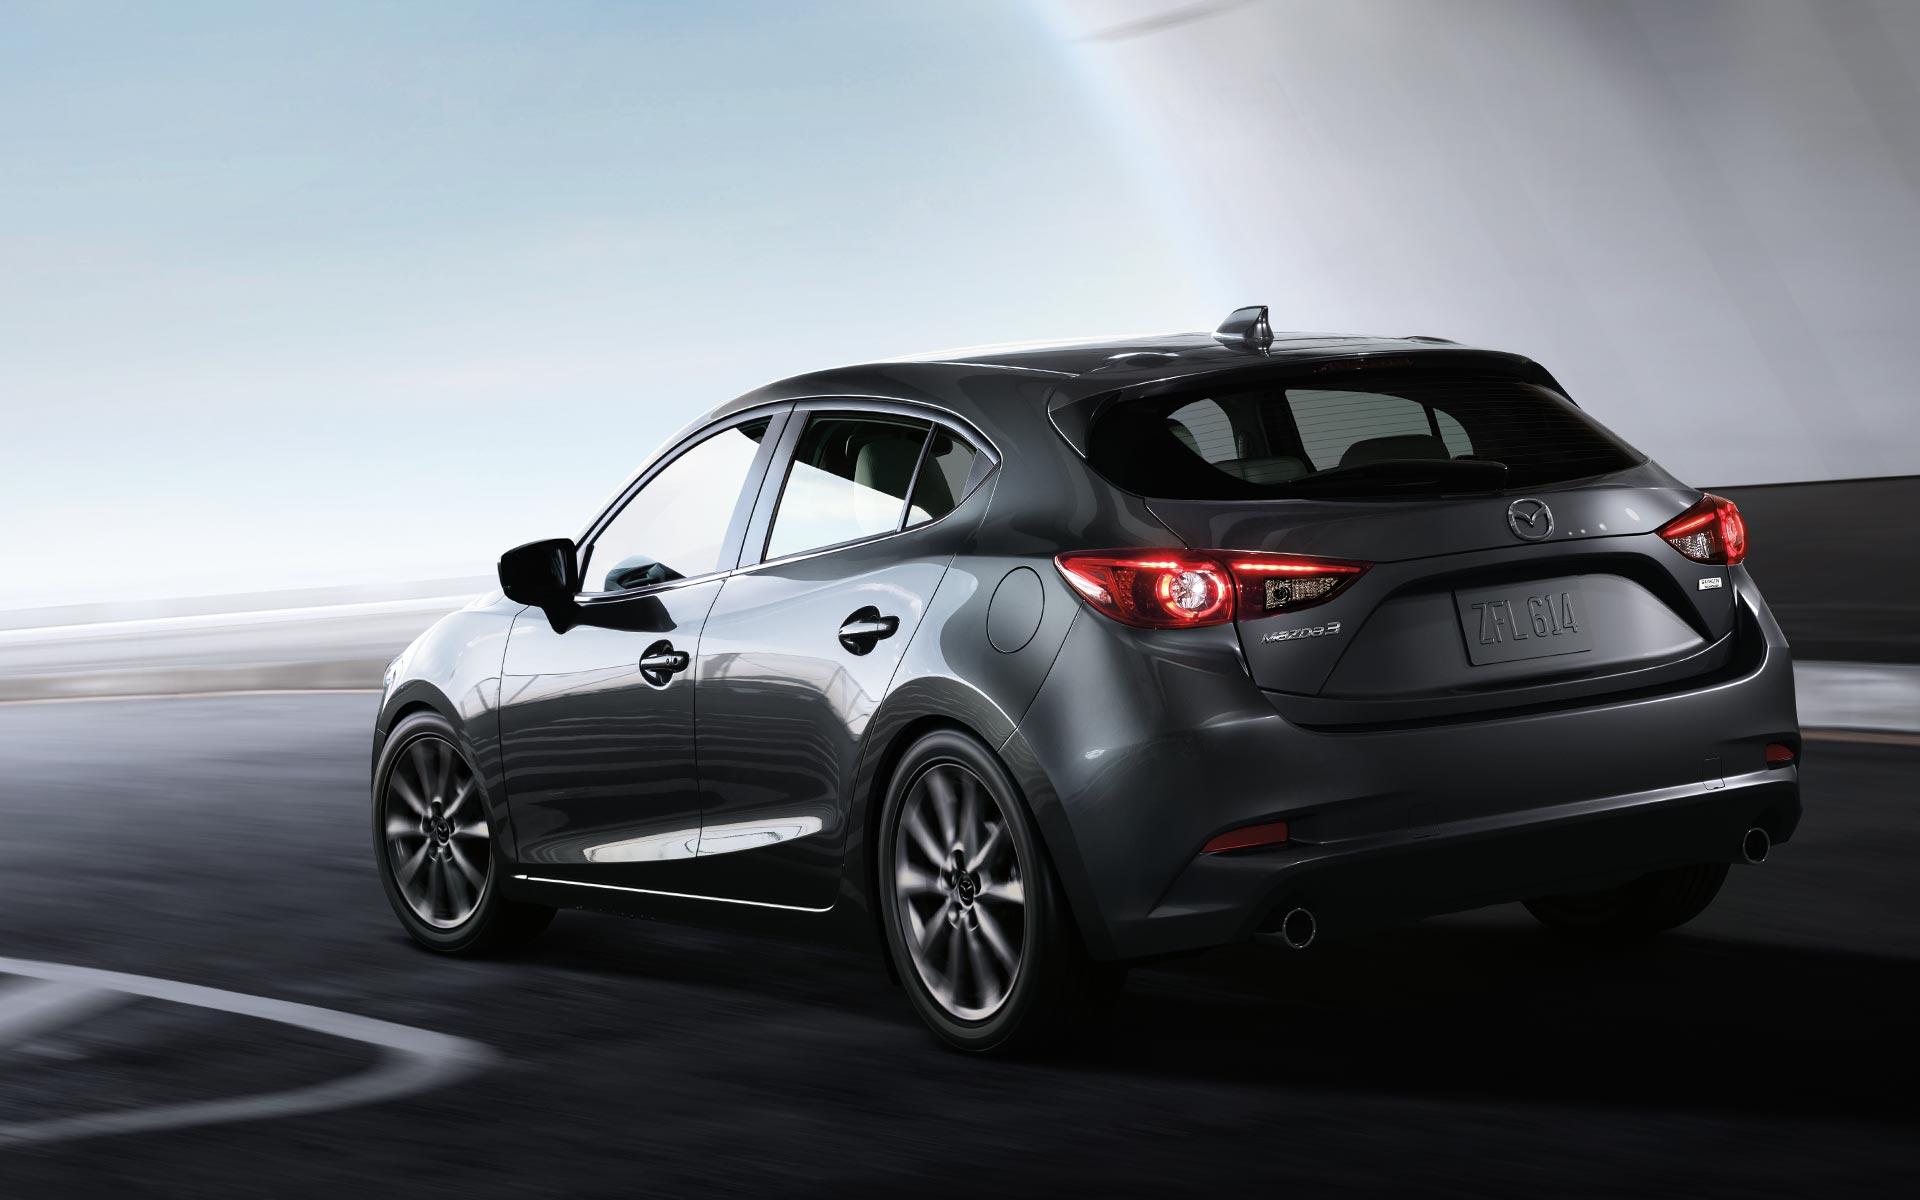 2018 Mazda 3 Hatchback Design Performance Features Mazda Usa